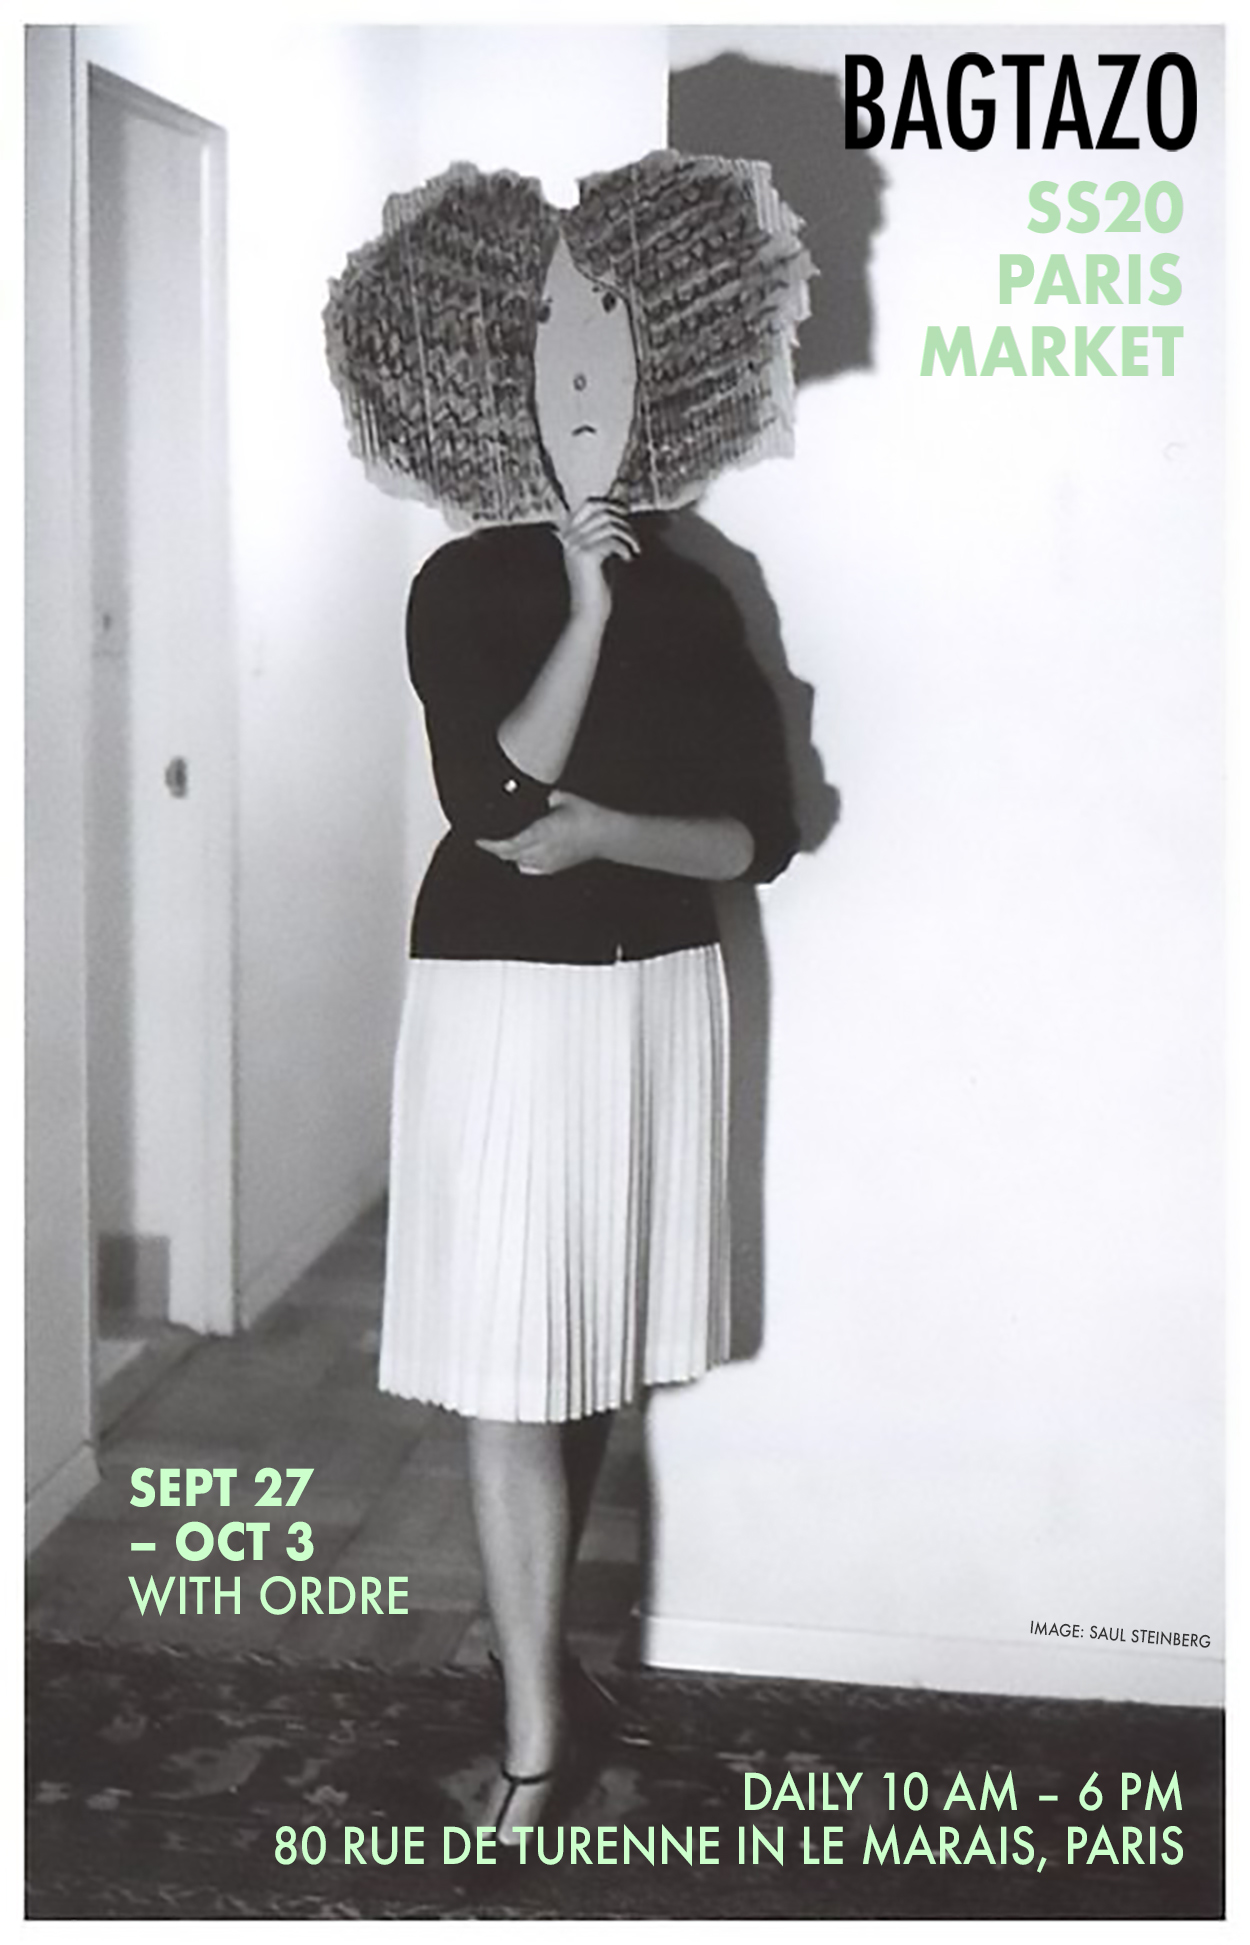 Bagtazo_Paris_Market_SS20